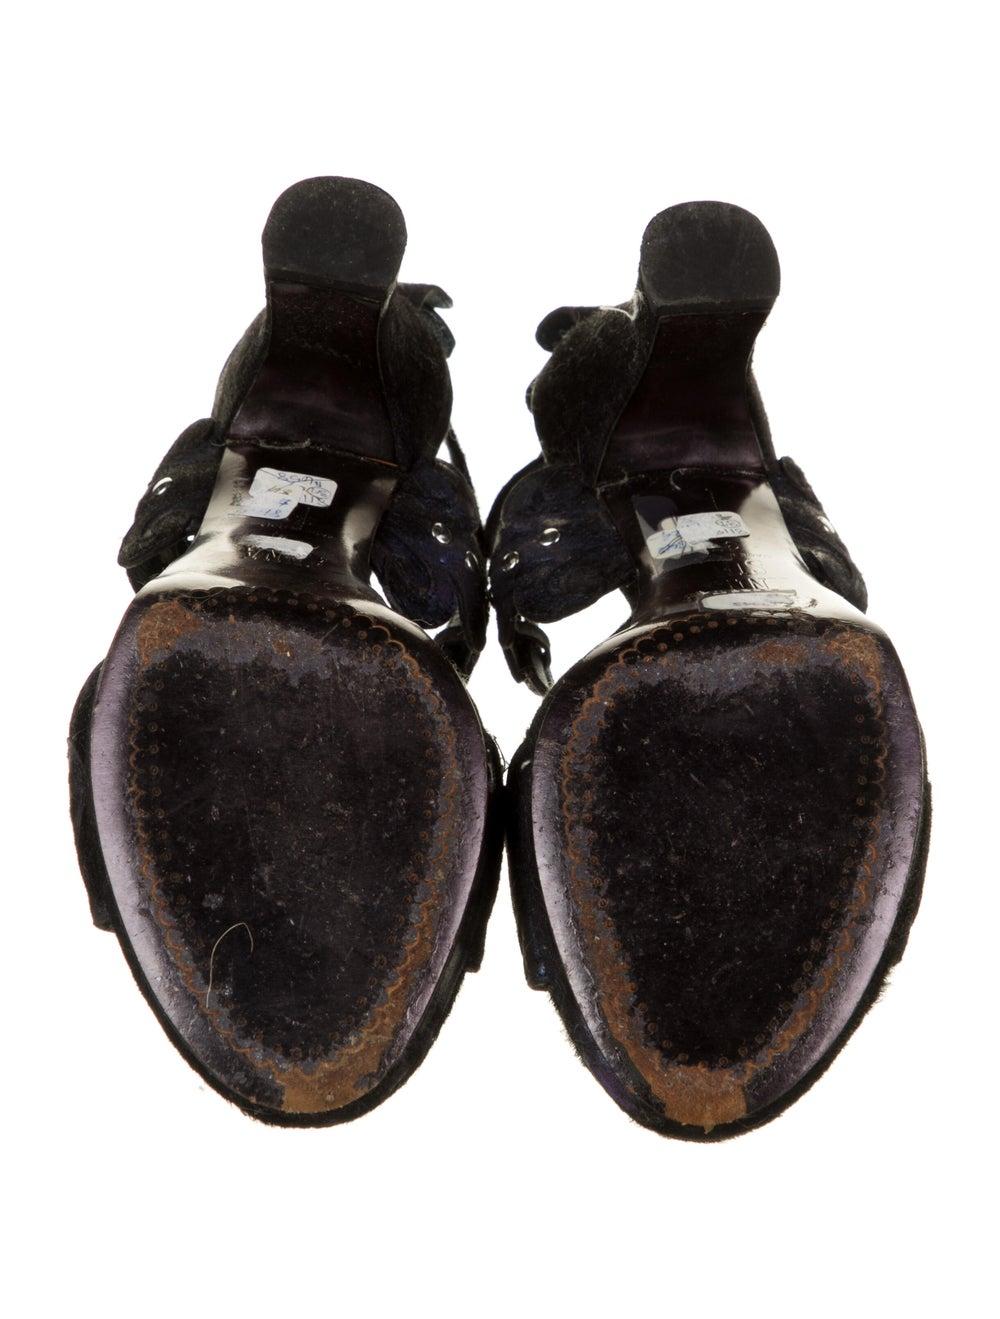 Anna Sui Sandals Black - image 5